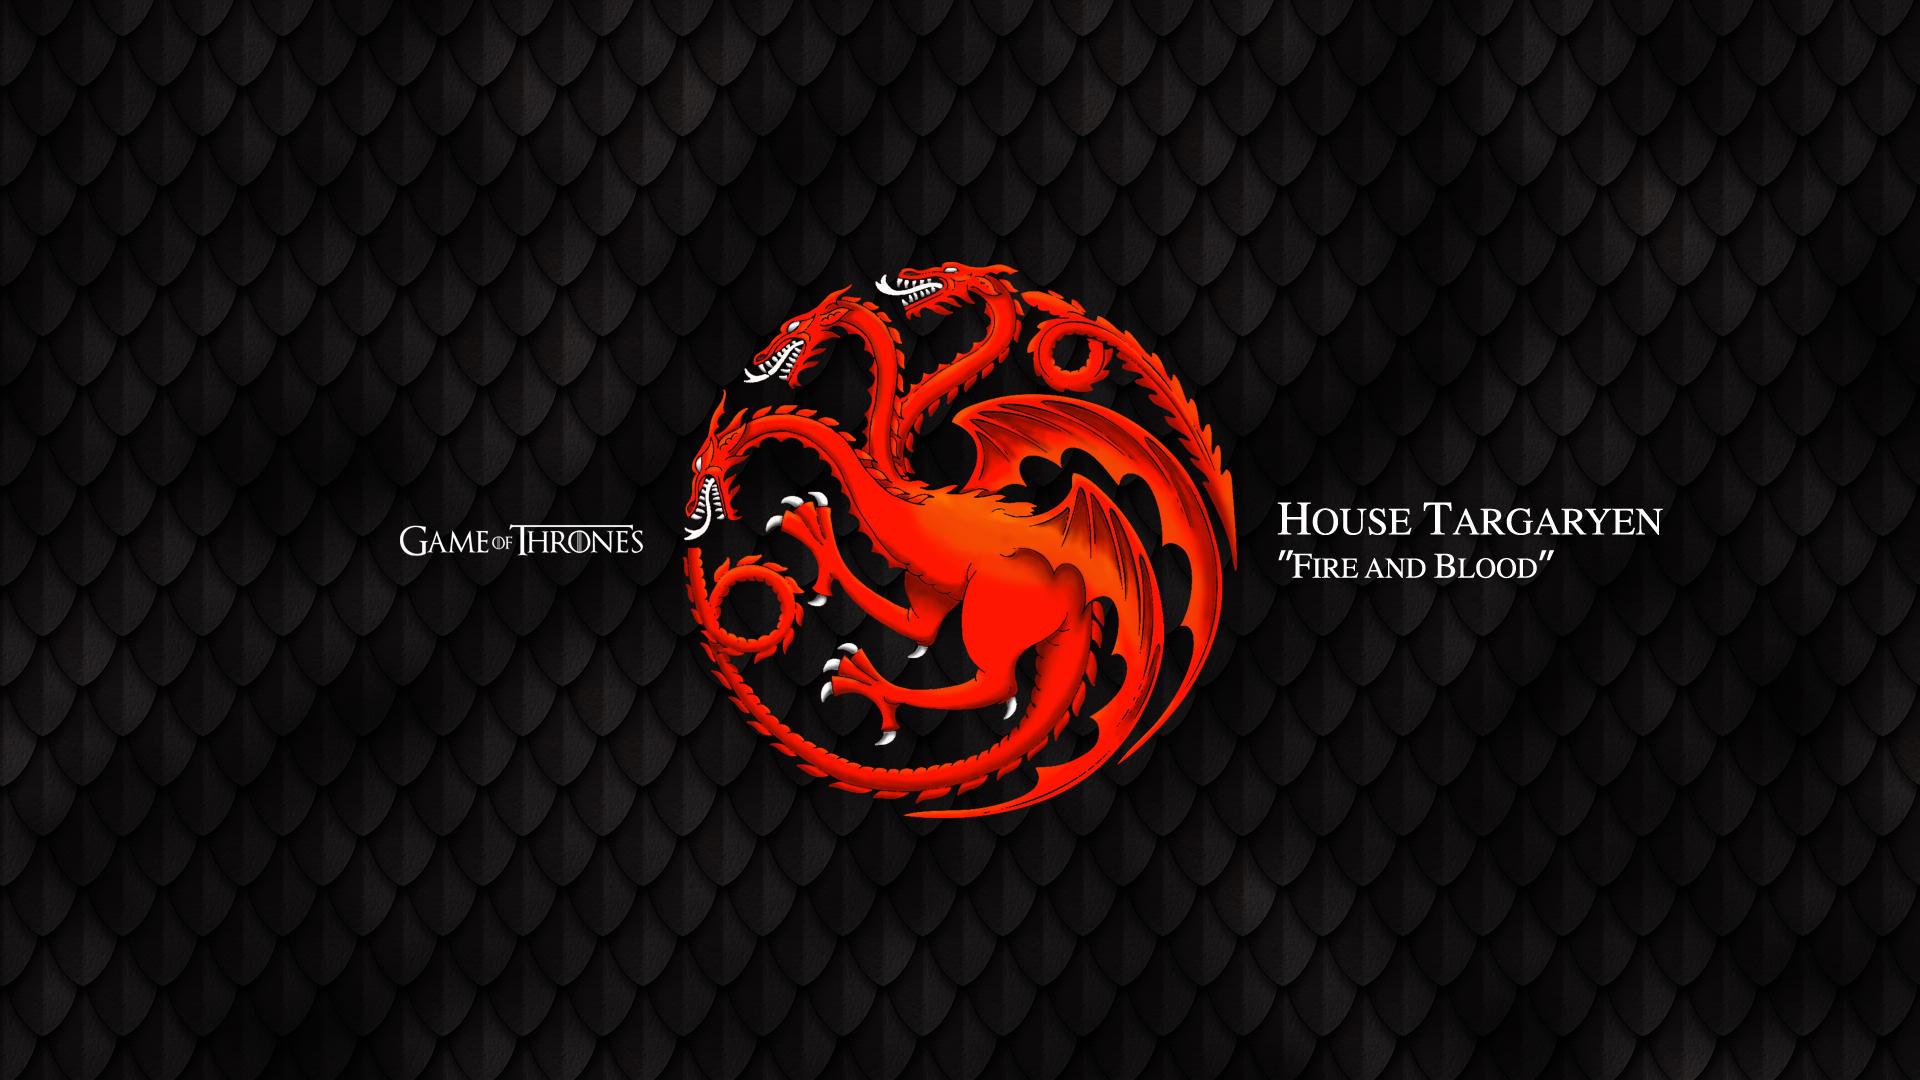 GoT: House Targ... Gaming Logos For Free